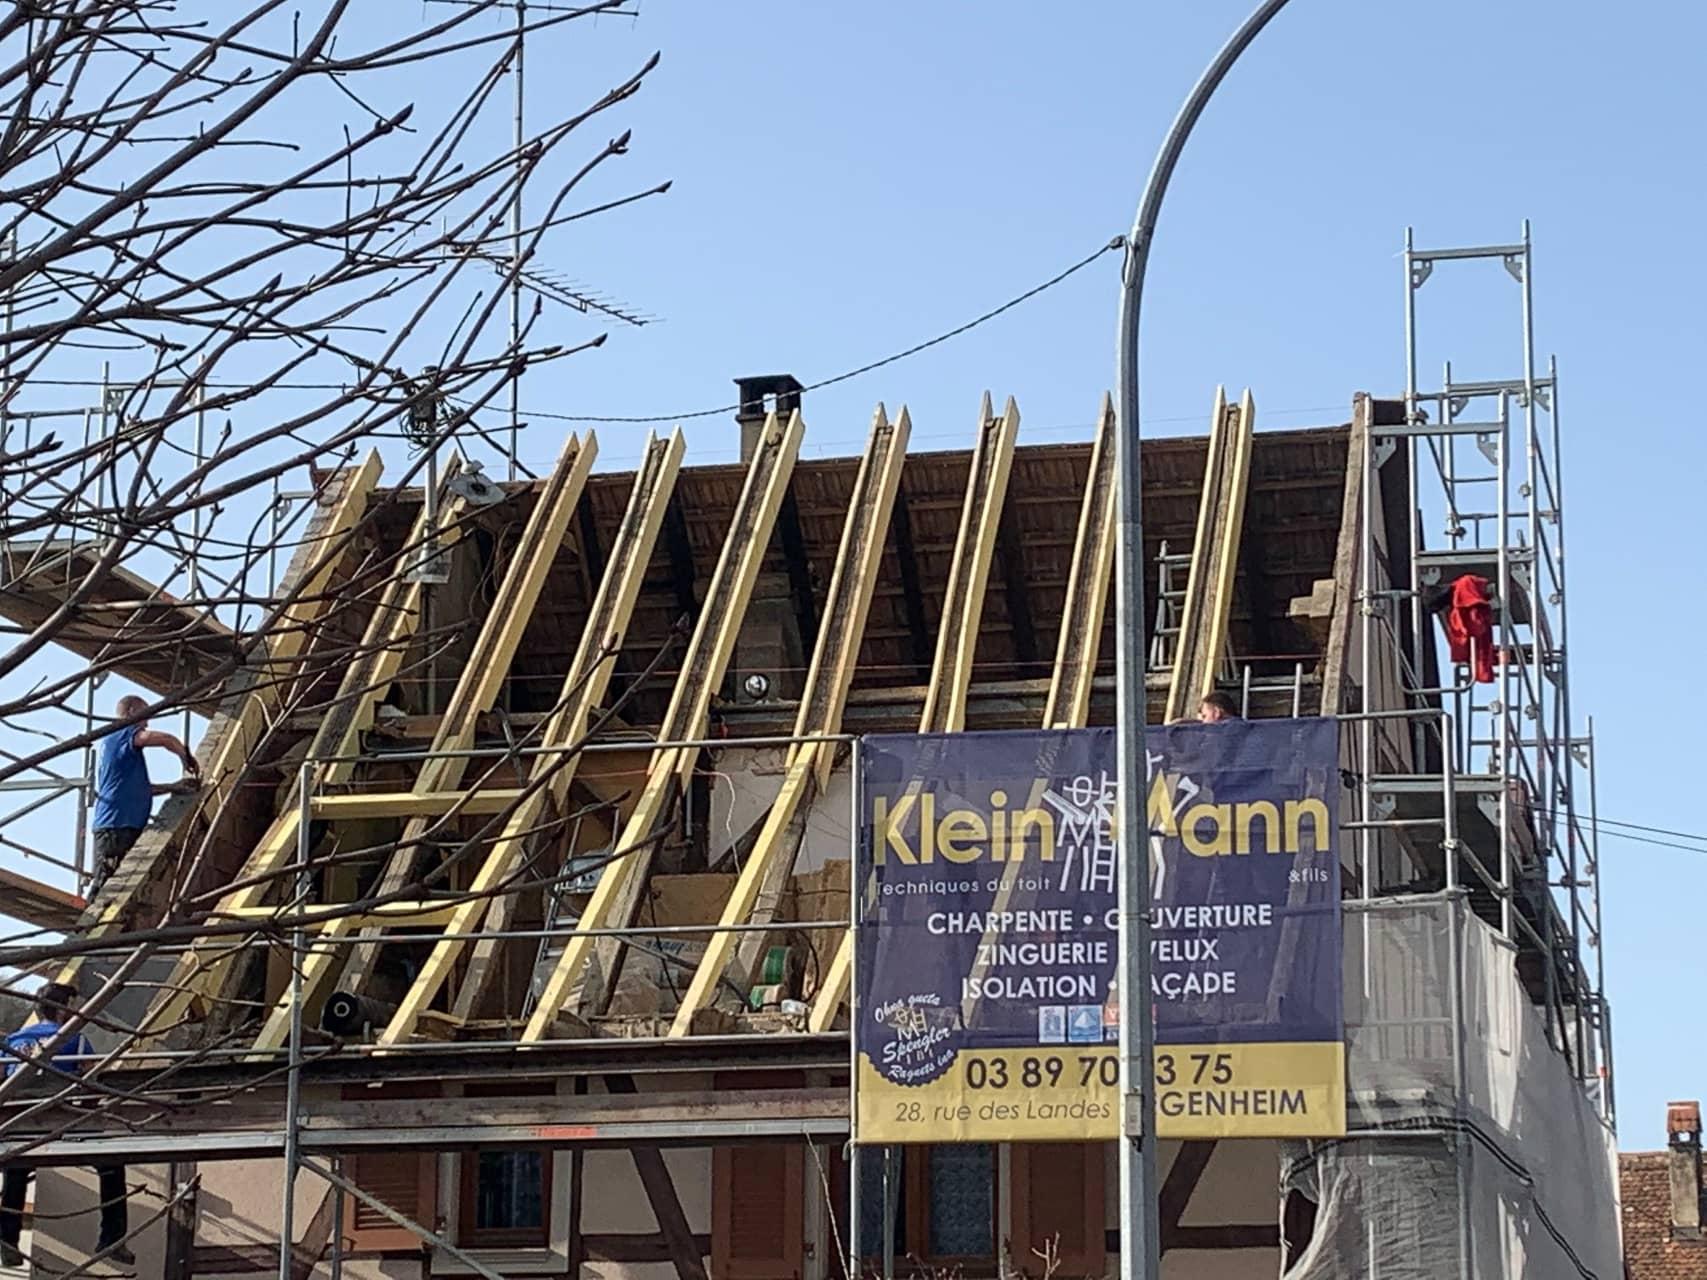 Rénovation toiture - Kleinmann et Fils (8)